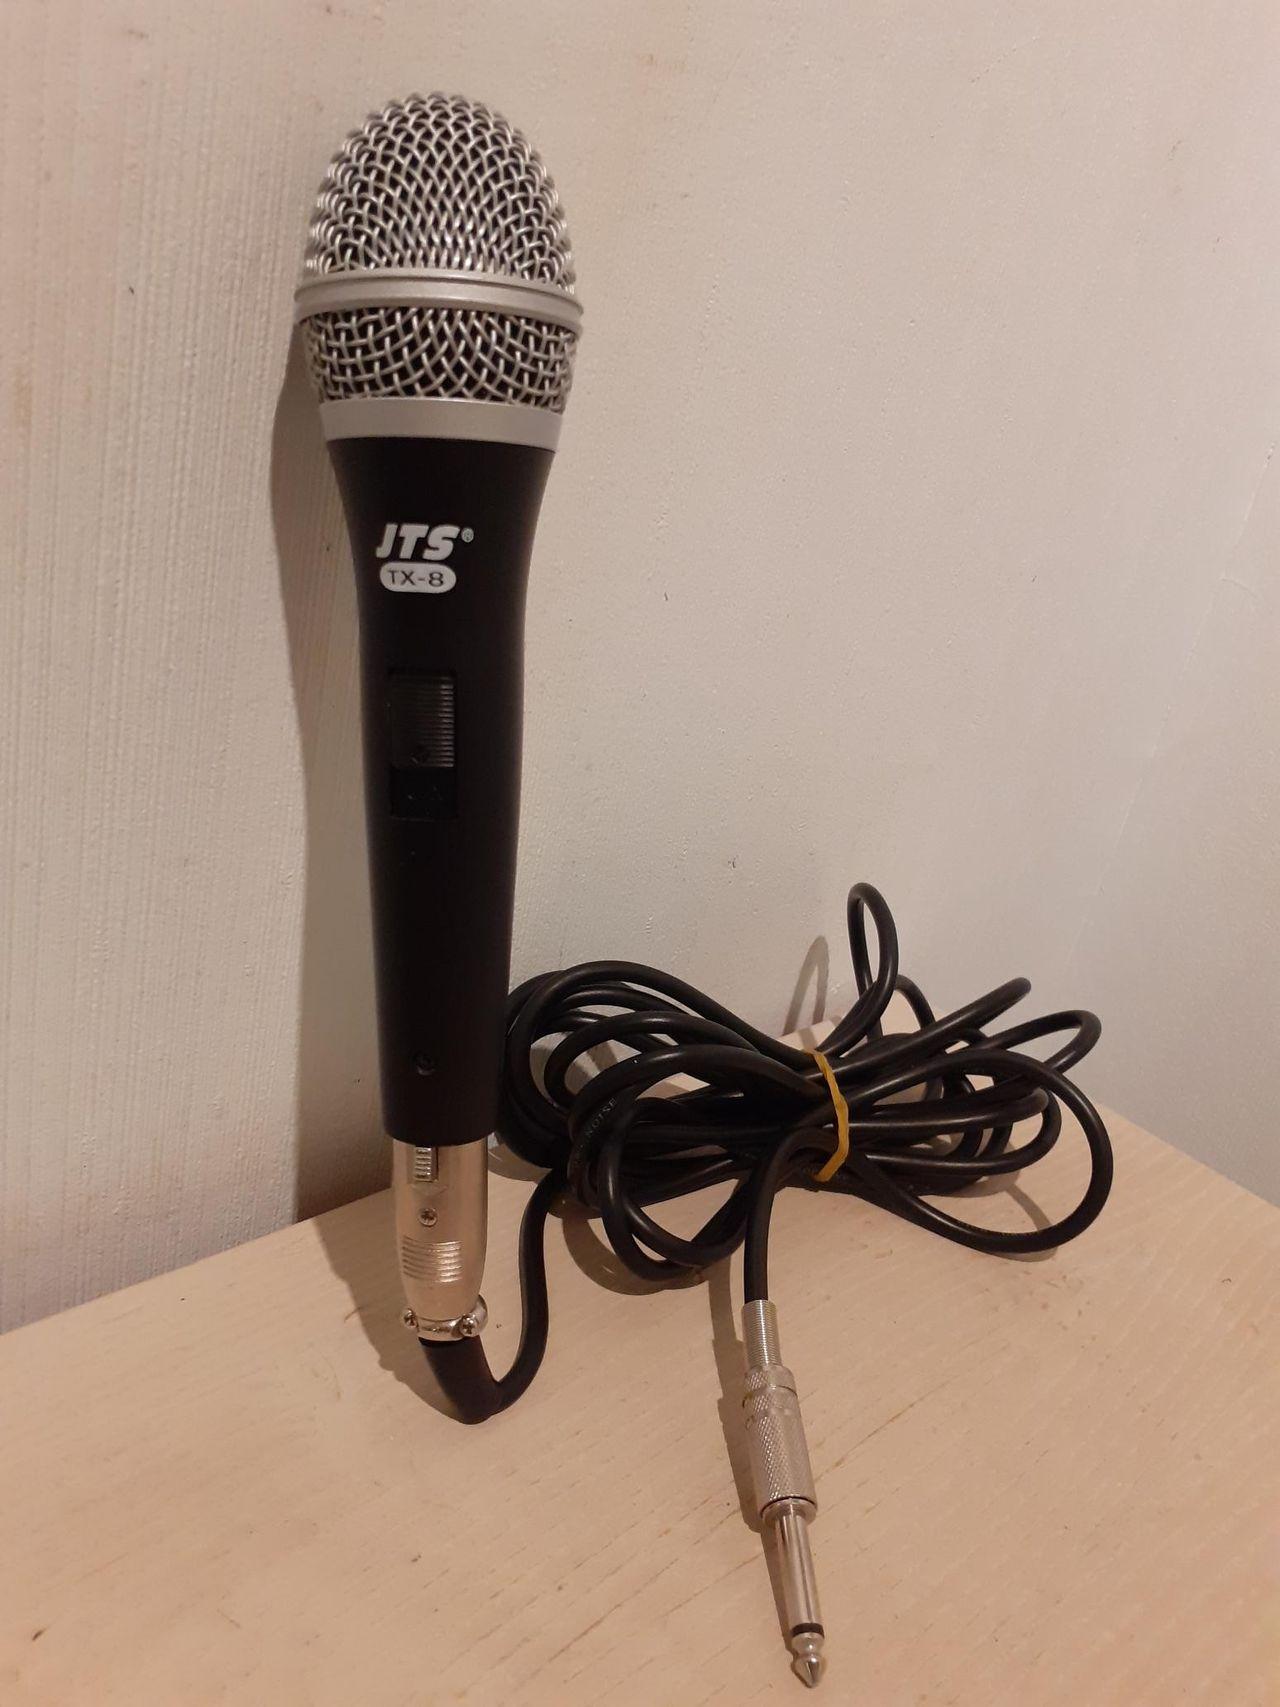 JTS TX 8 dynamisk mikrofon med lang kabel | FINN.no